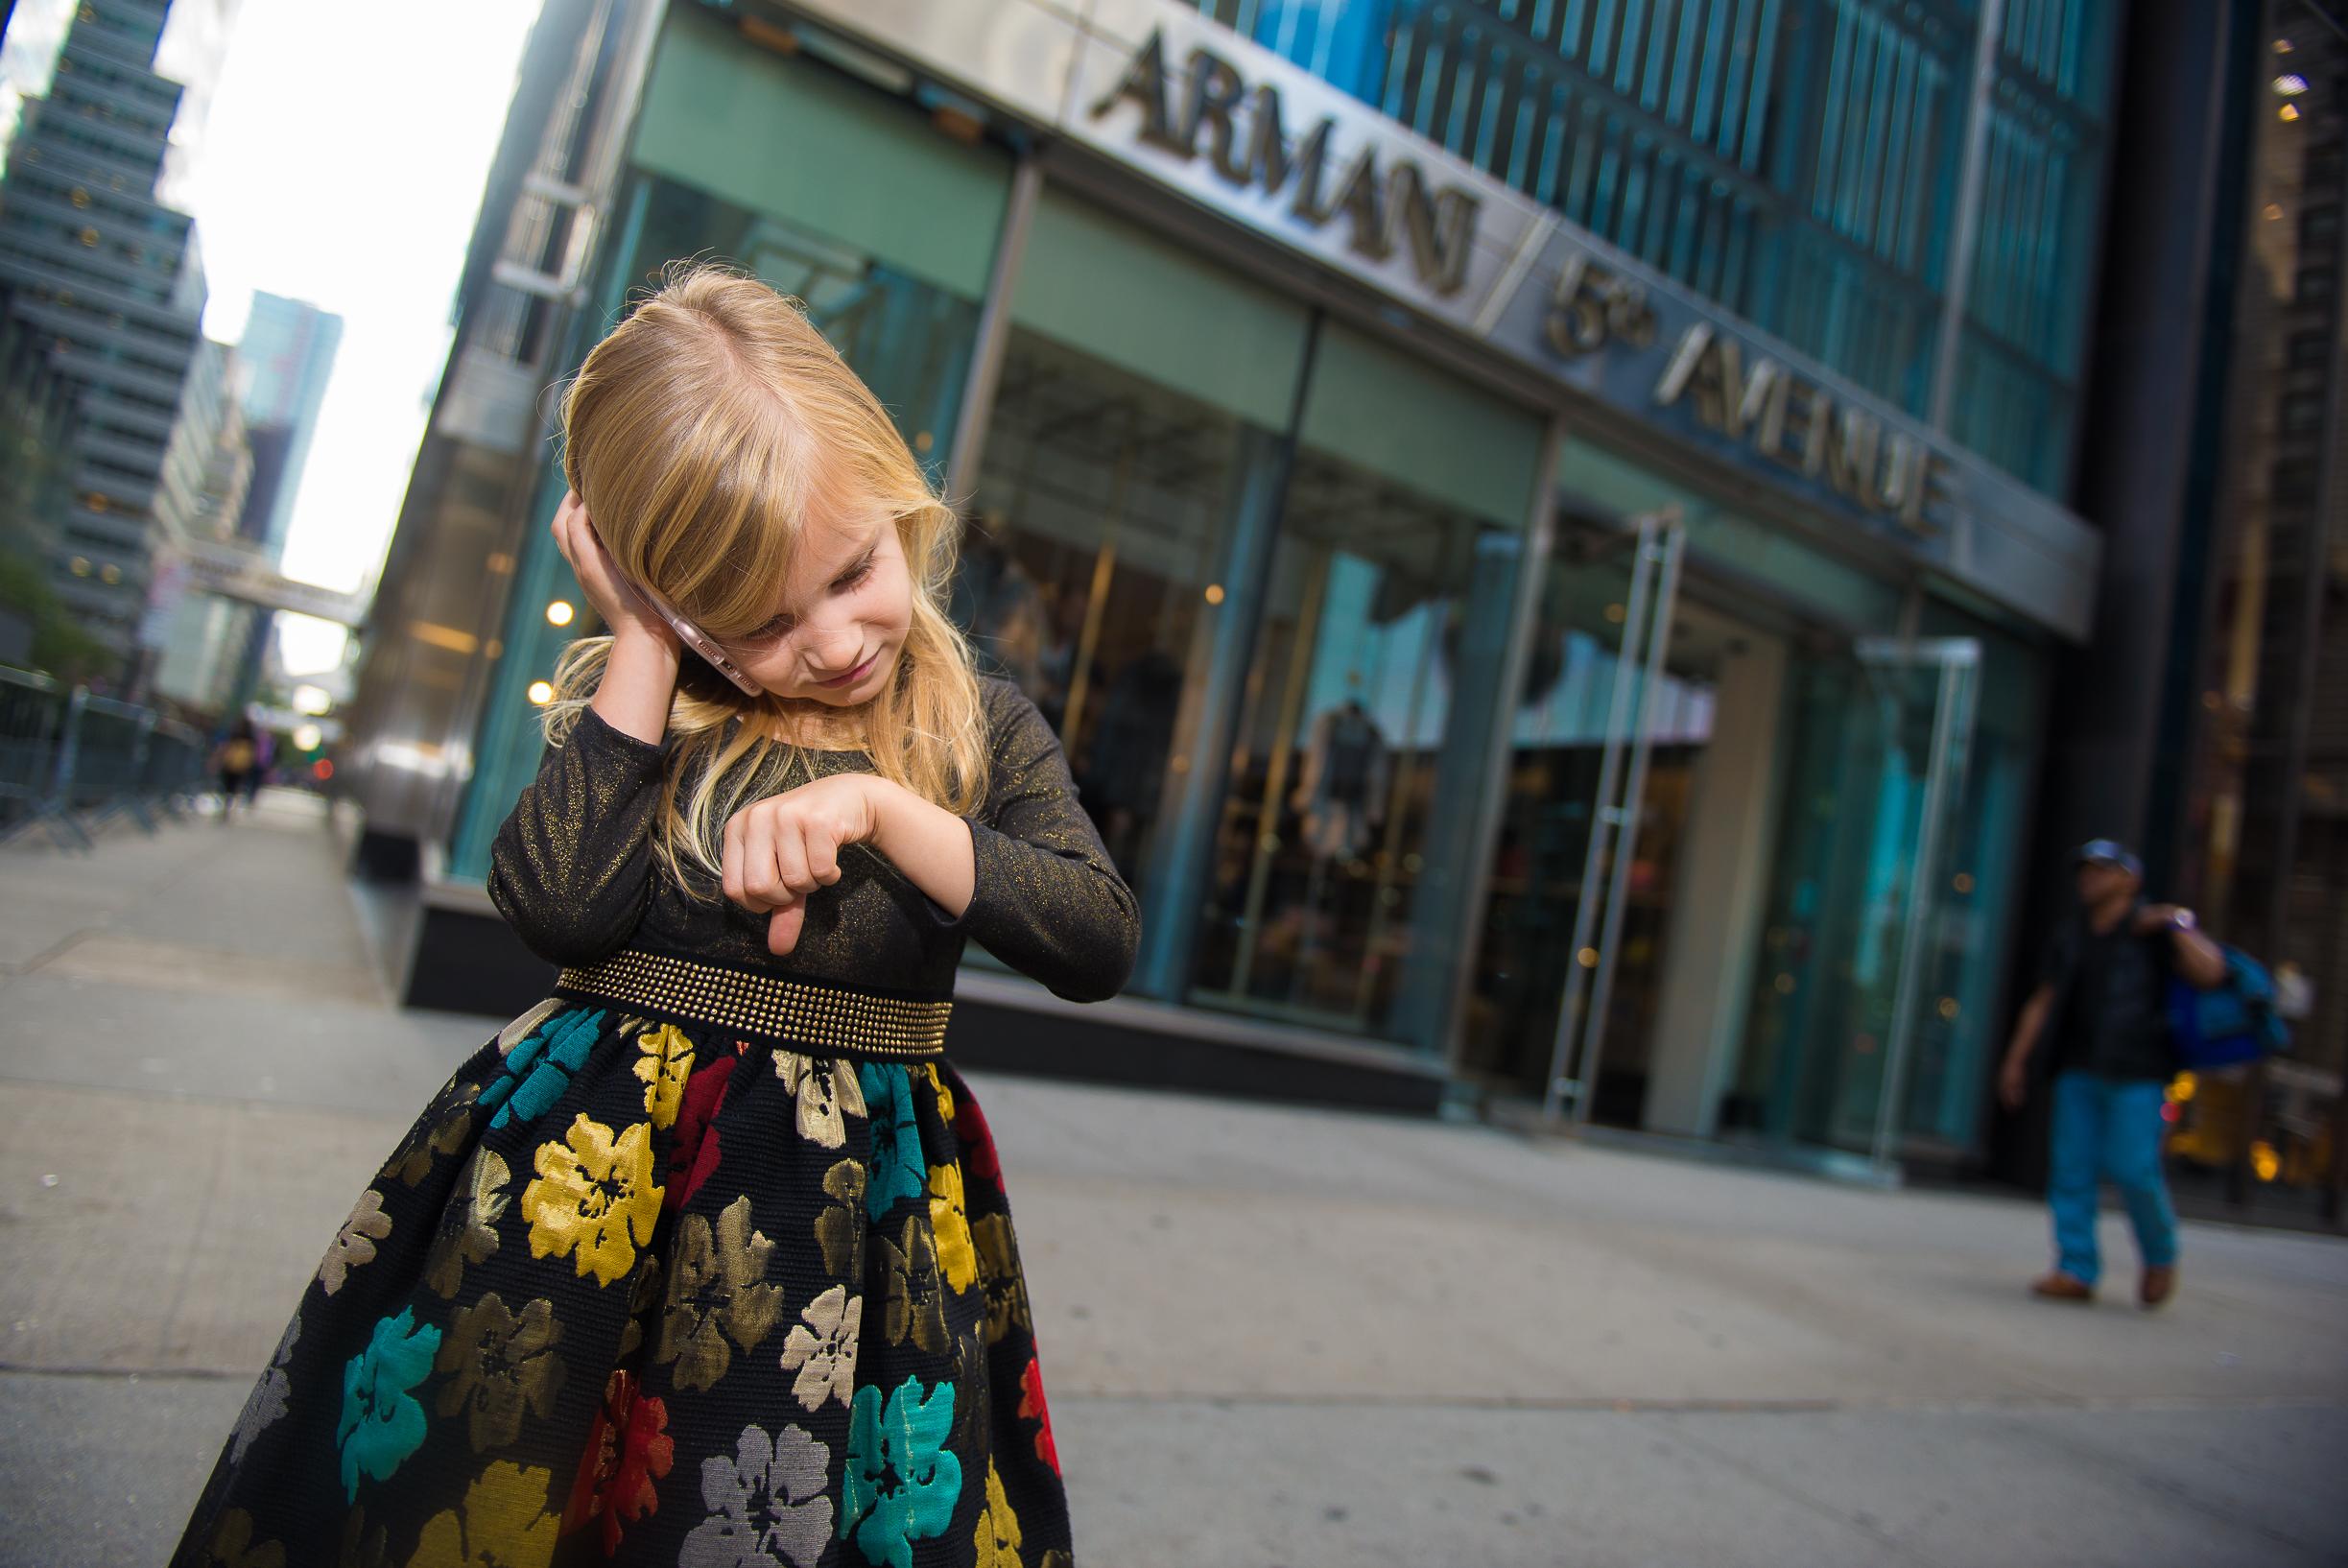 CaseyKate - Shot By LeVue Photography - NY Portrait Photographer